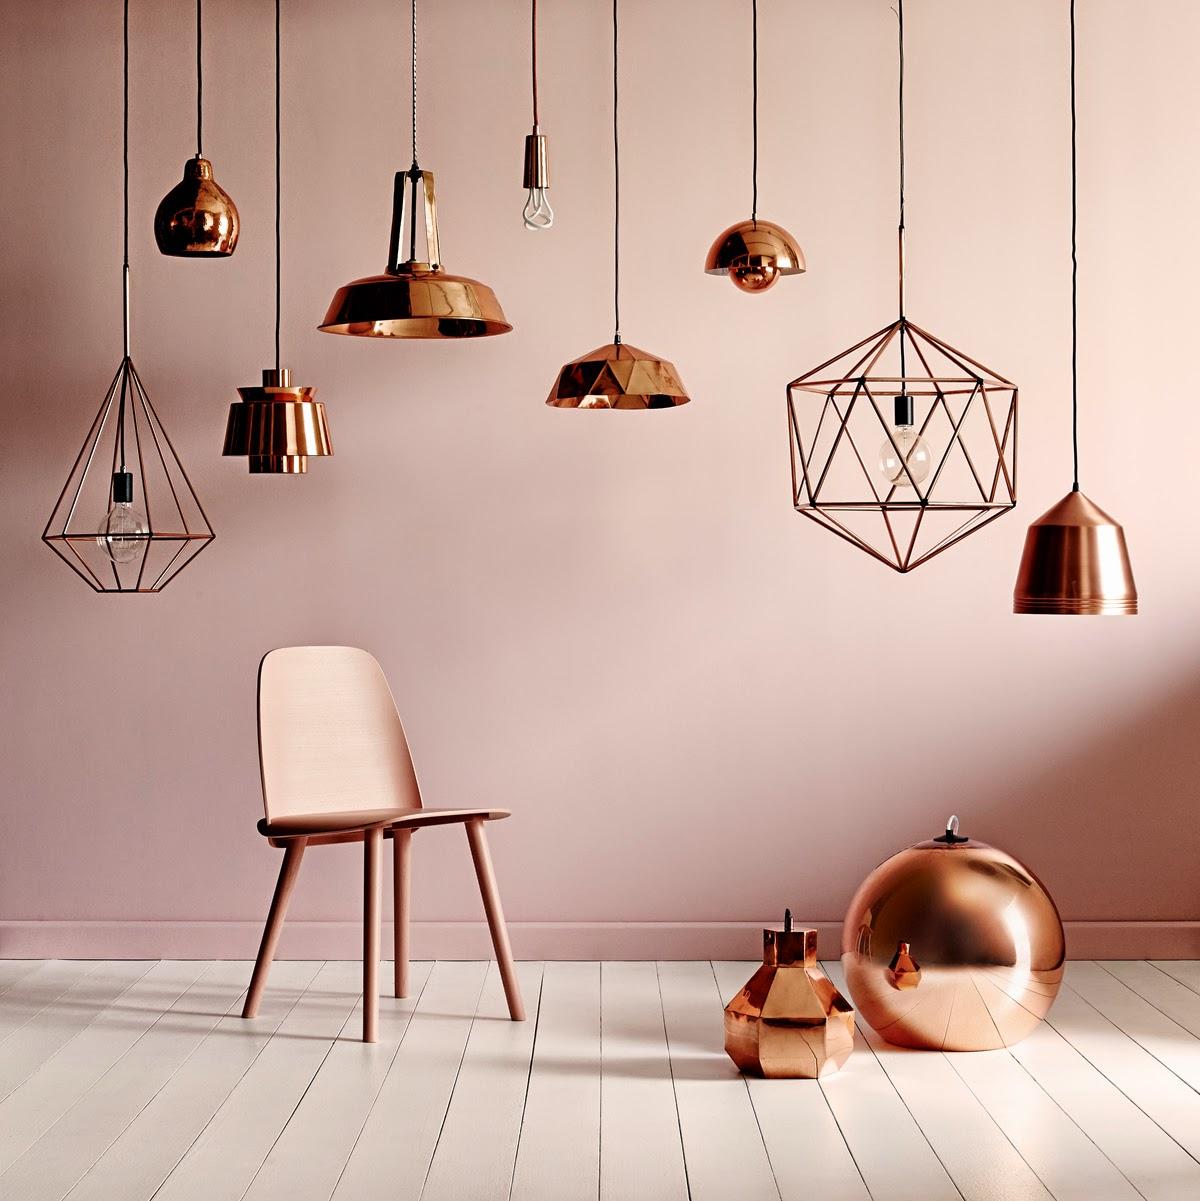 Fall Trends Fall Trends: Copper Design Inspirations Fall Trends Copper Design Inspirations